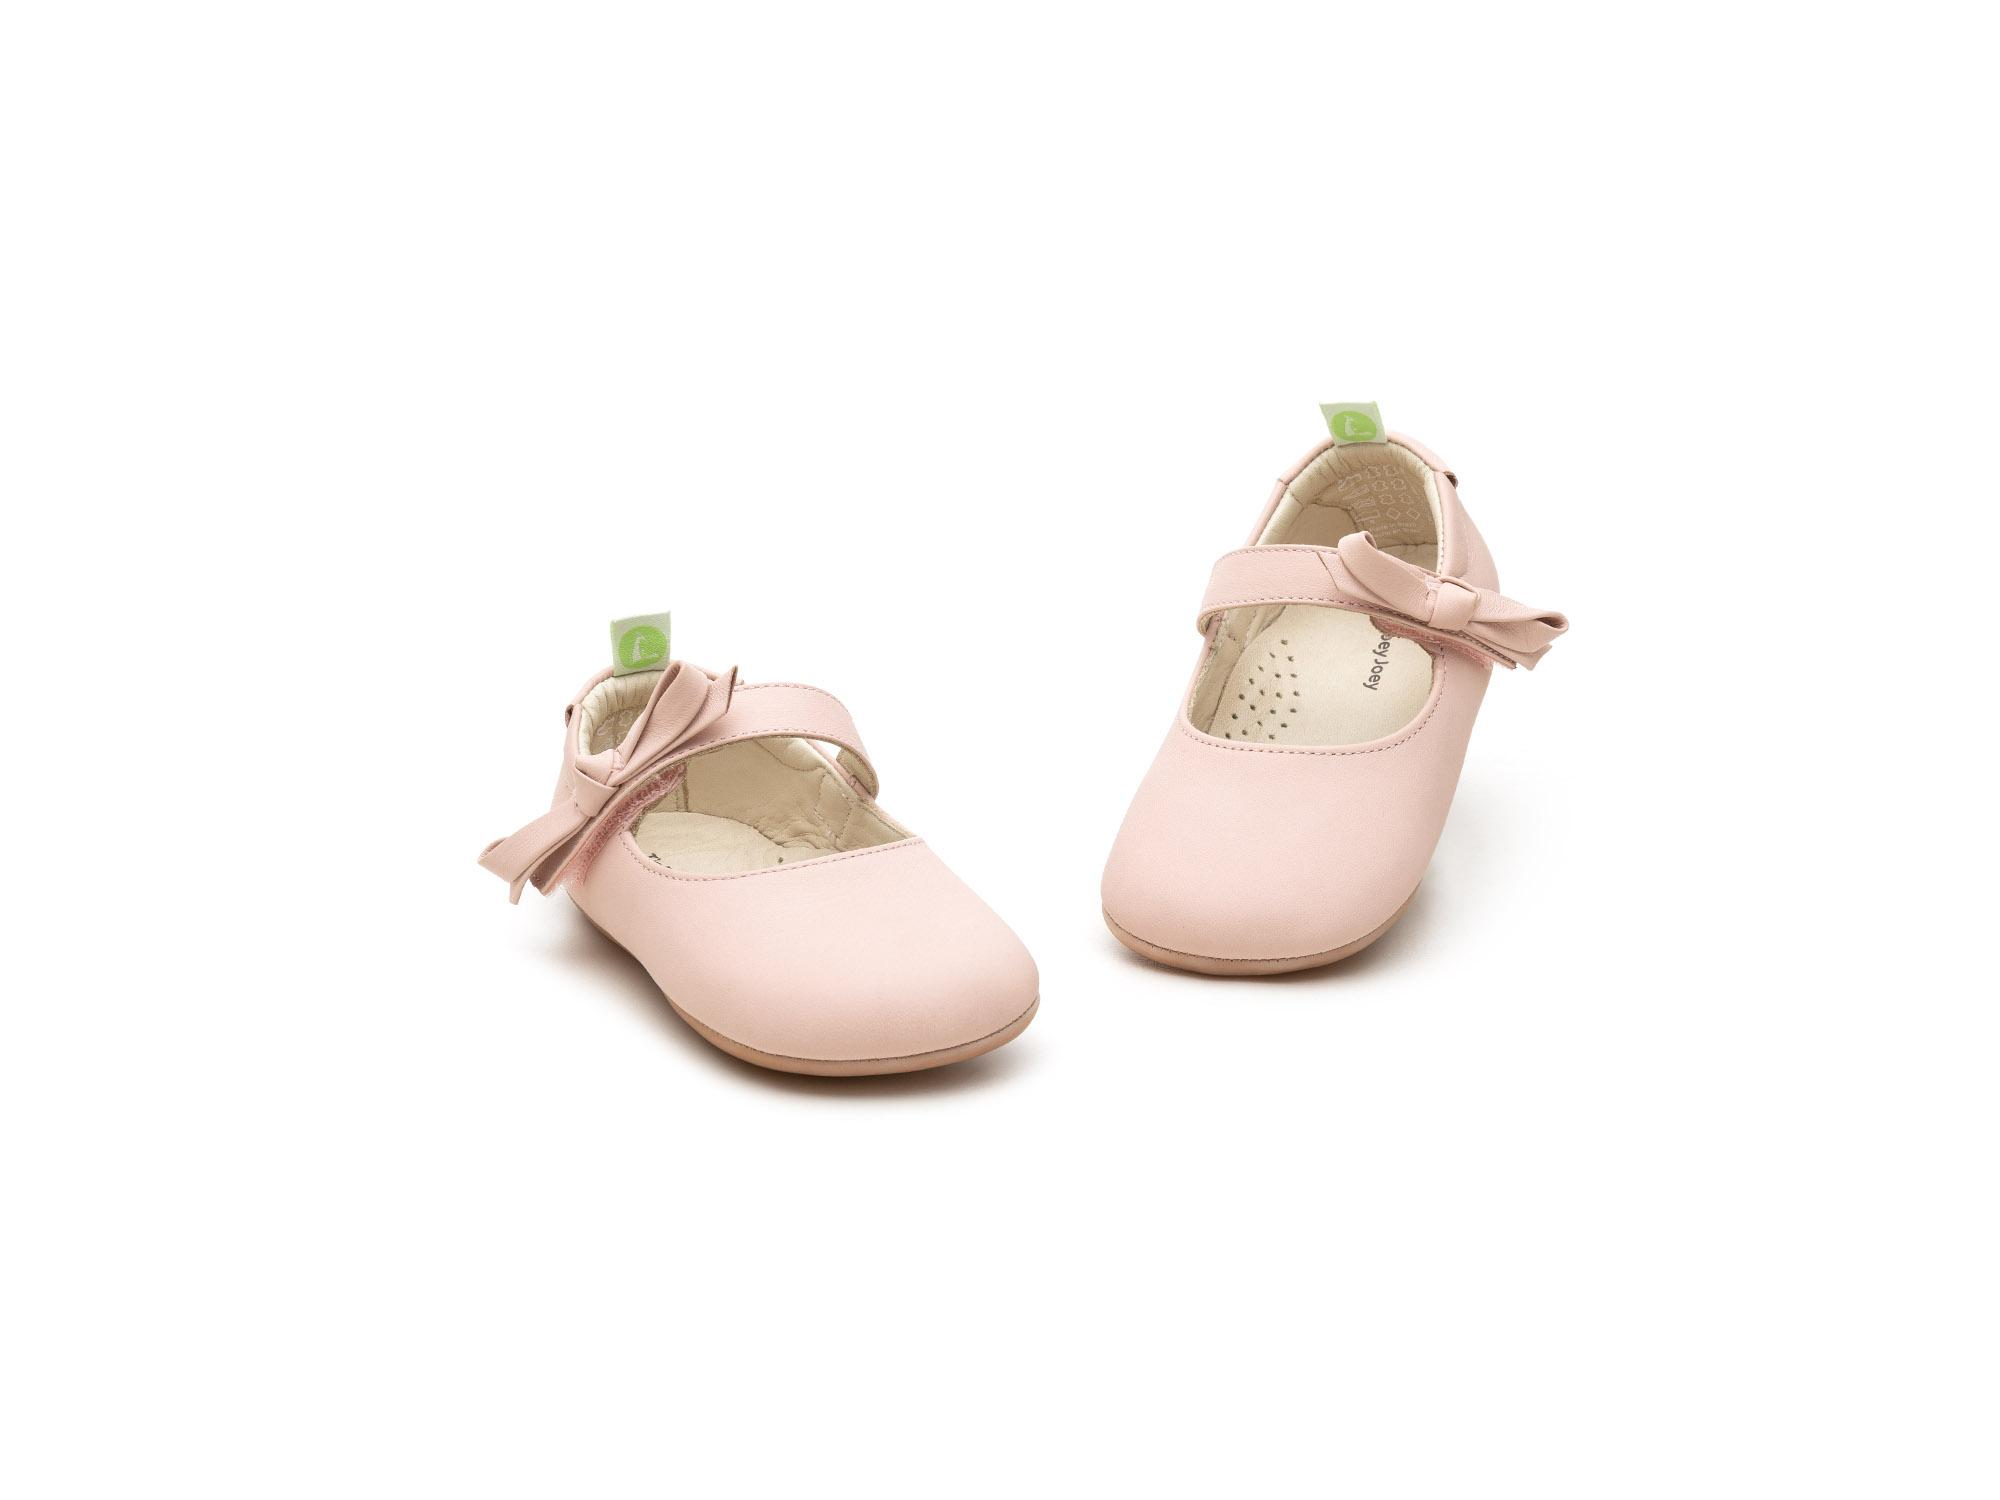 sapatilha Bebê feminino dorothy